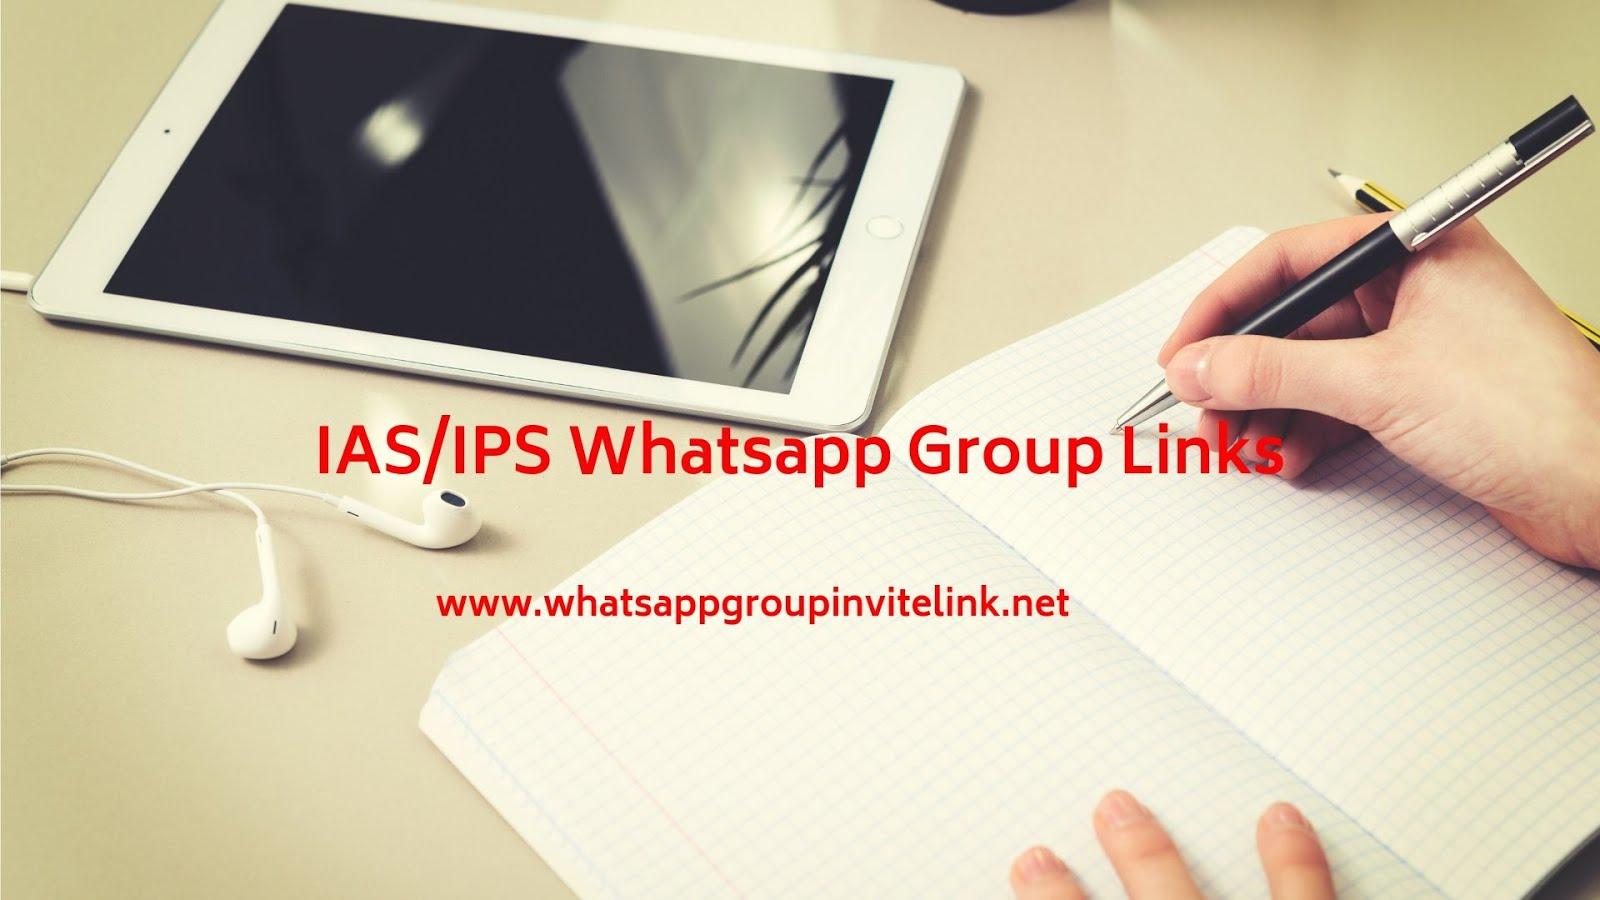 Whatsapp Group Invite Links: IAS/IPS Whatsapp Group Links